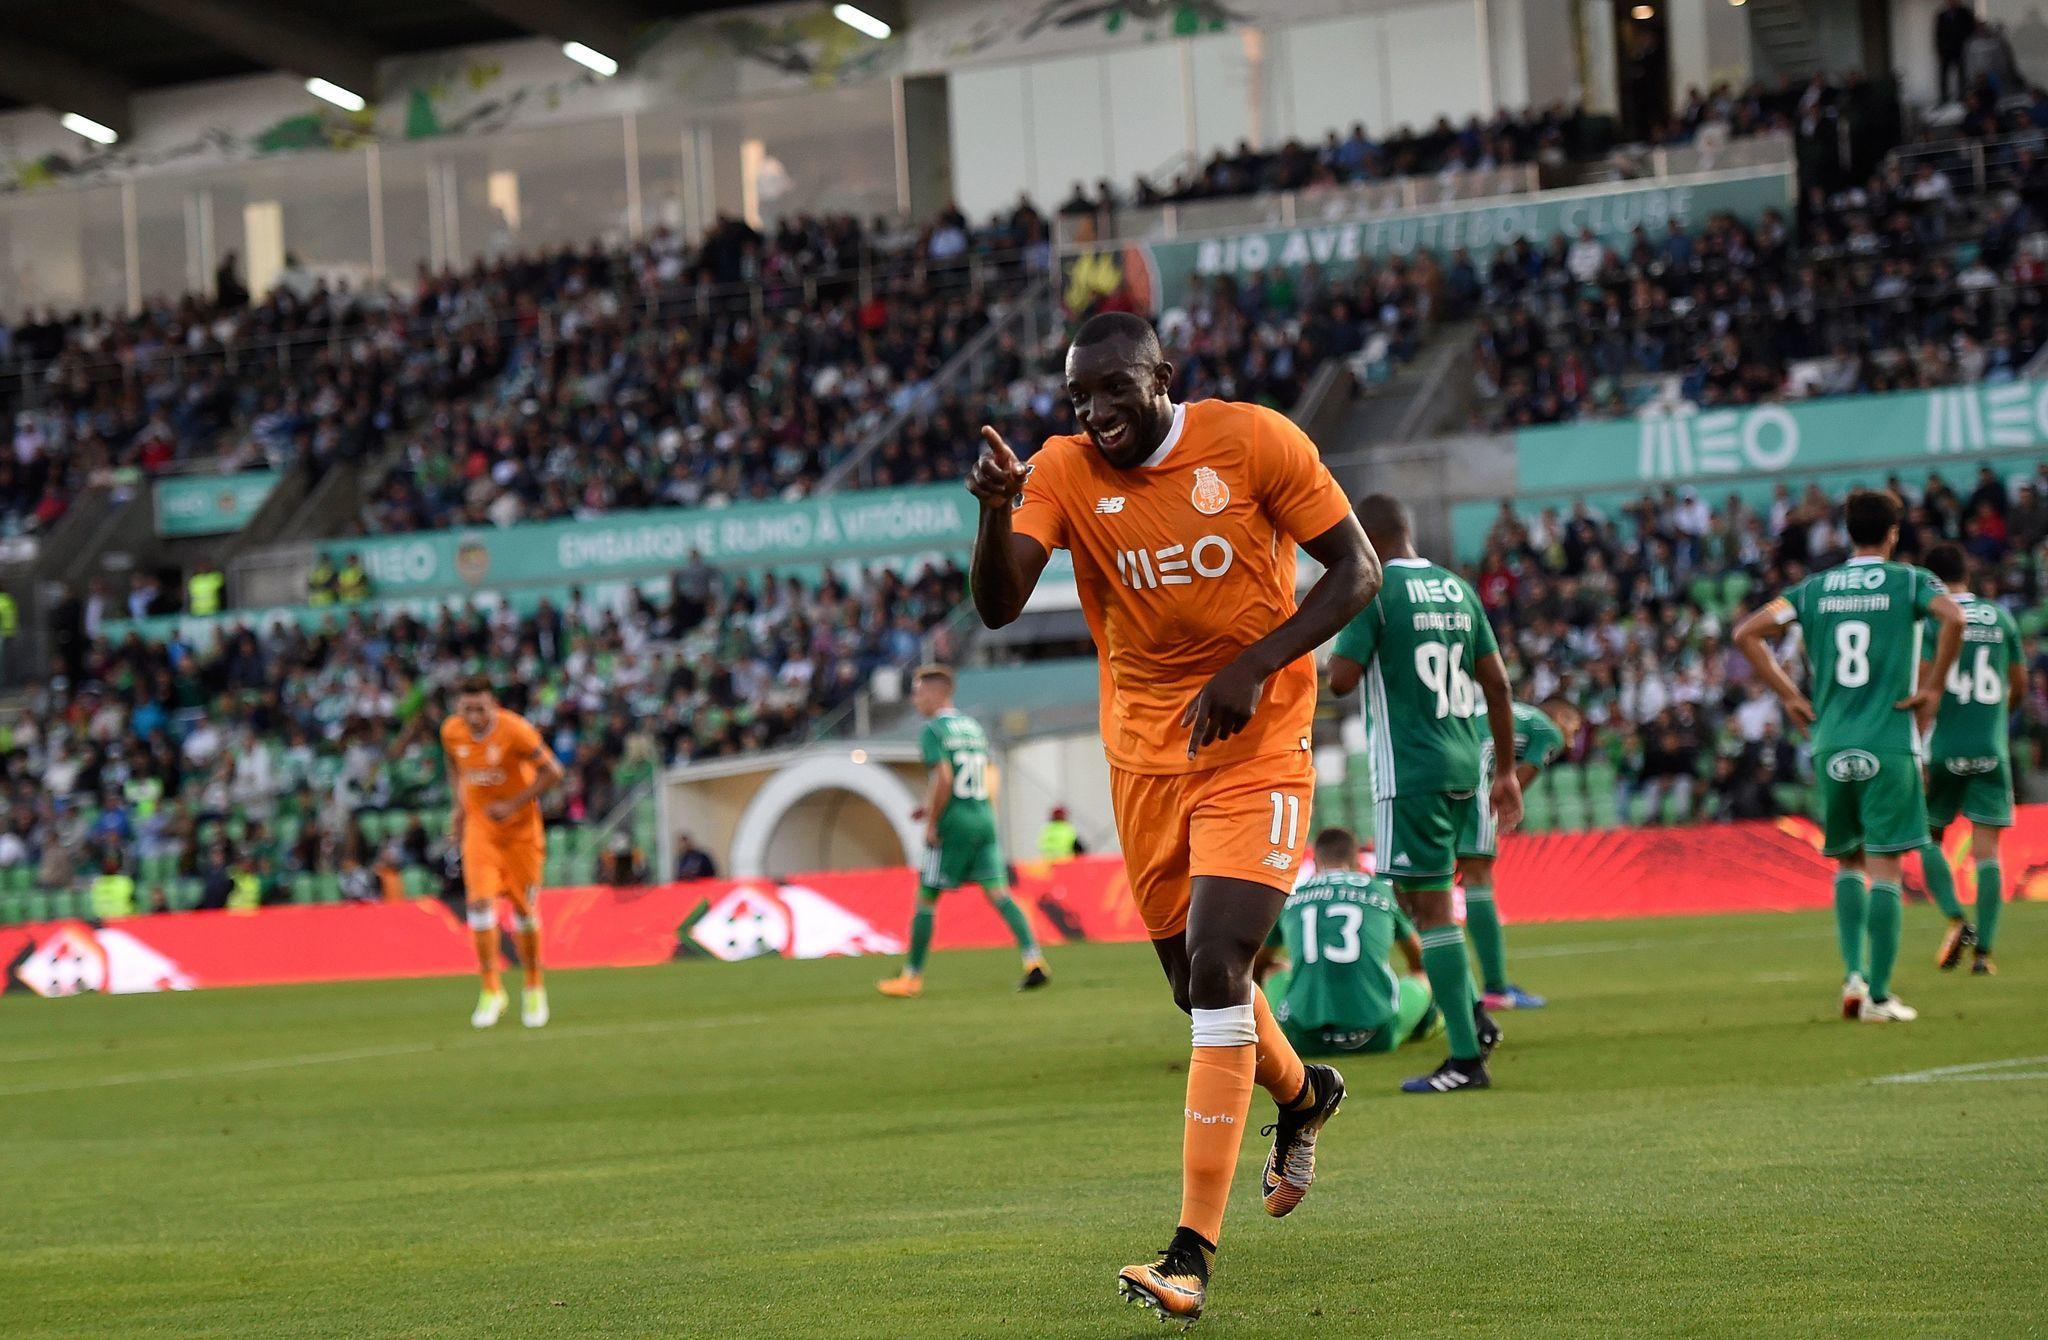 Porto beats Rio Ave 2-1 to stay perfect in Portugal